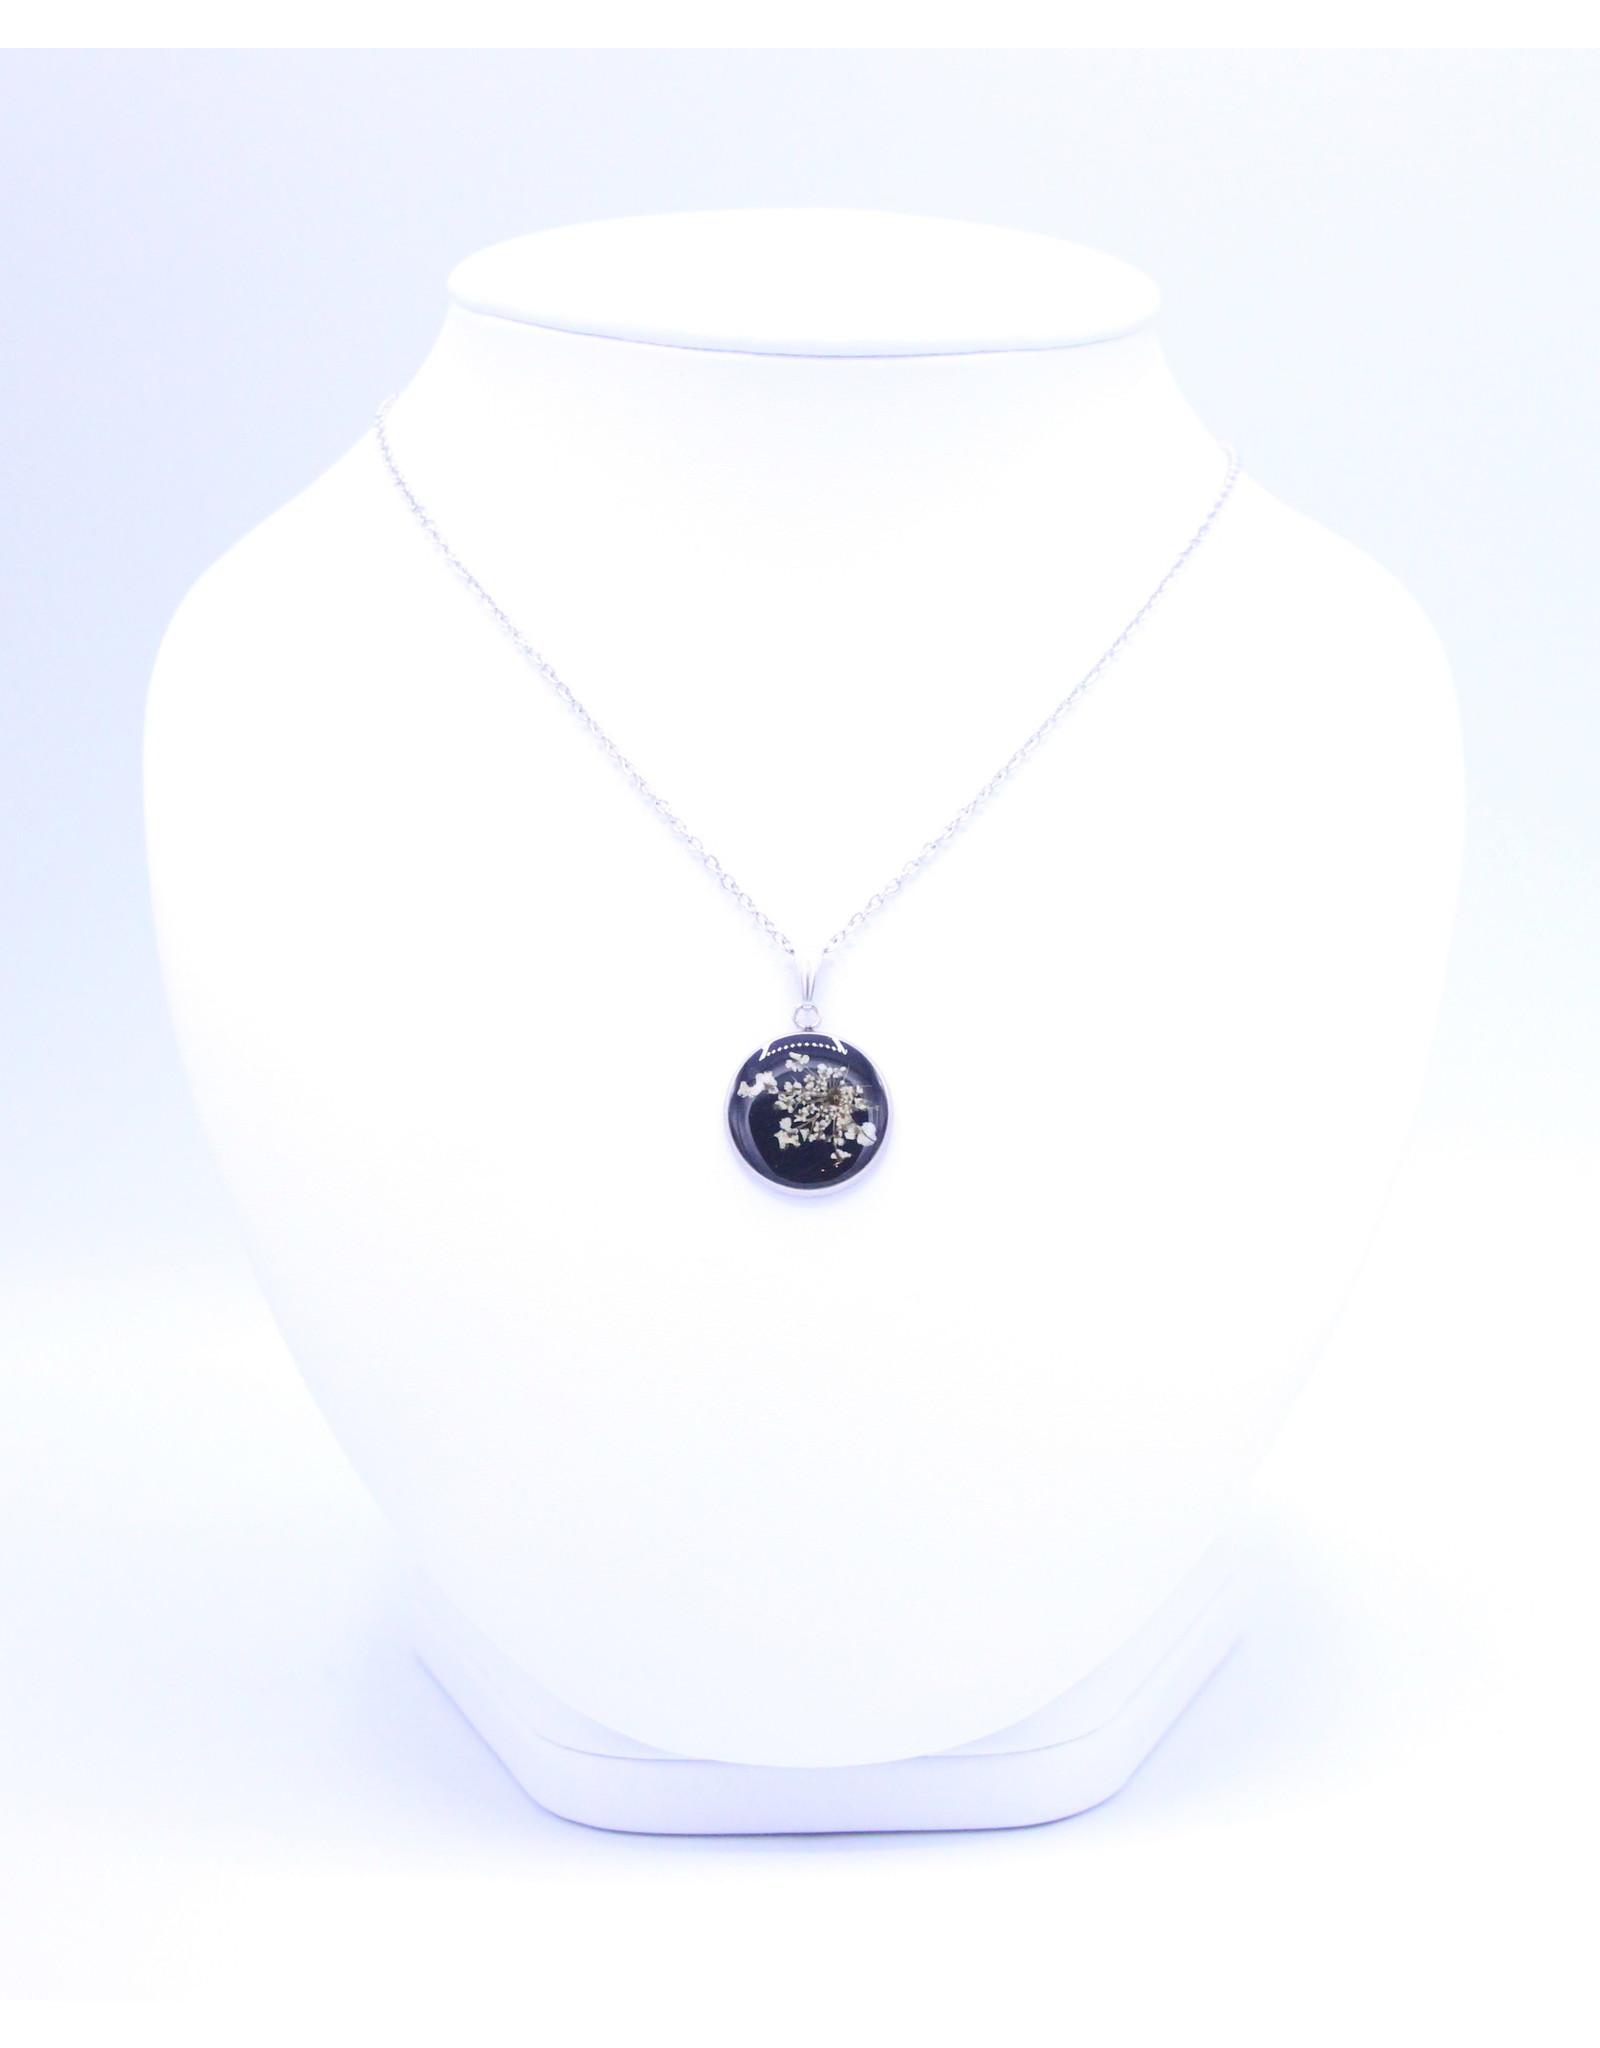 20mm Queen Anne's Lace Necklace Black - N20QABK1